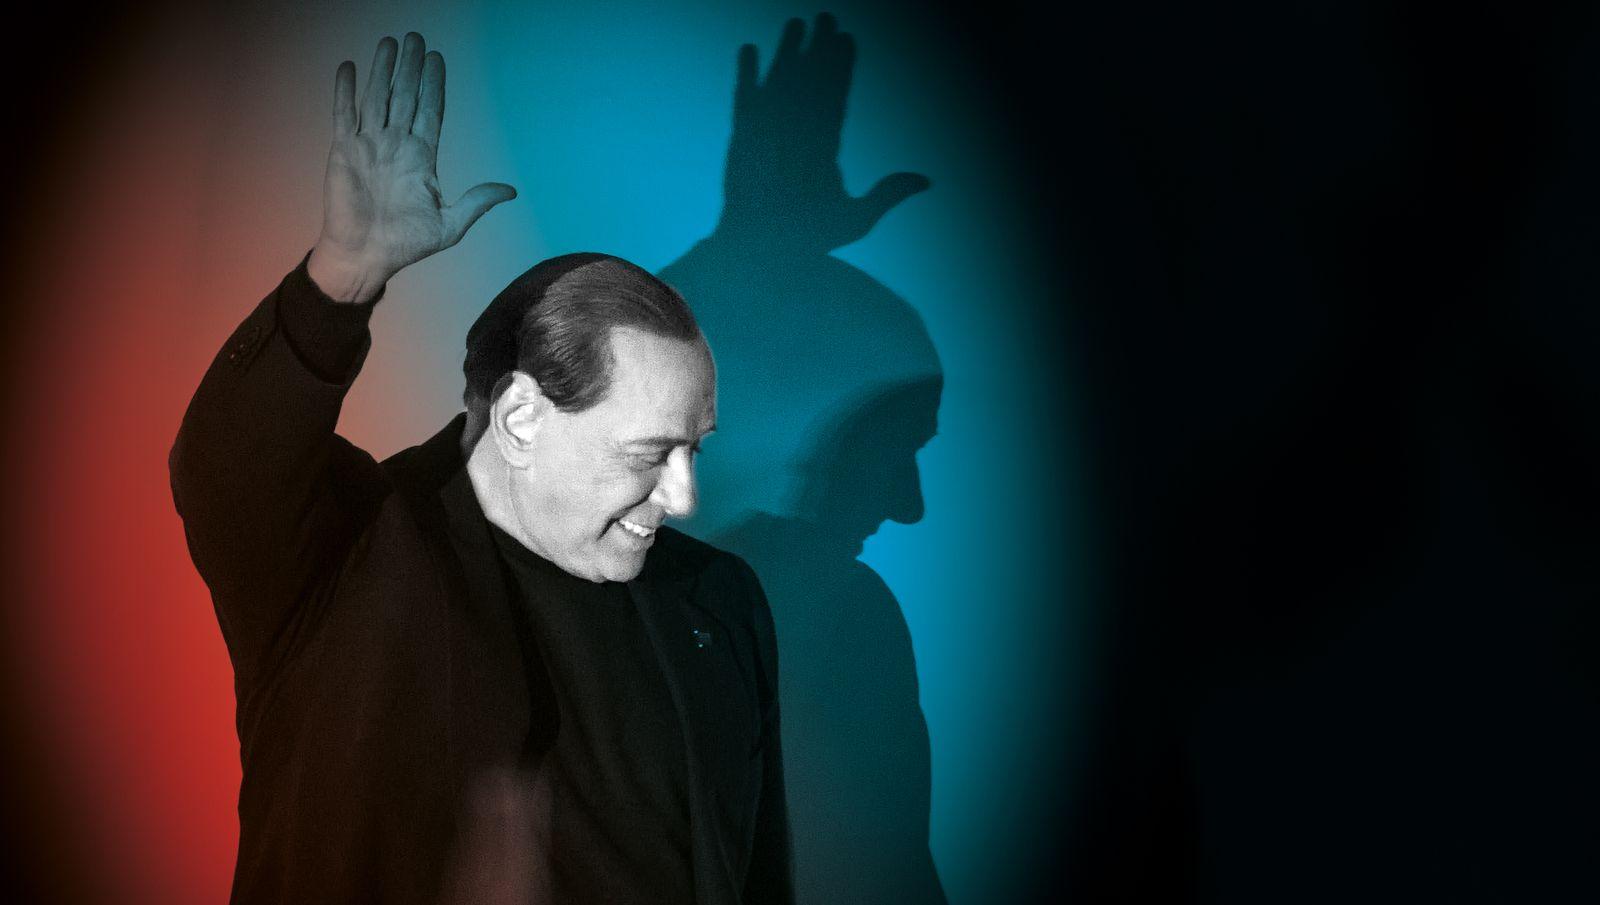 Berlusconi loses Senate seat over tax fraud conviction